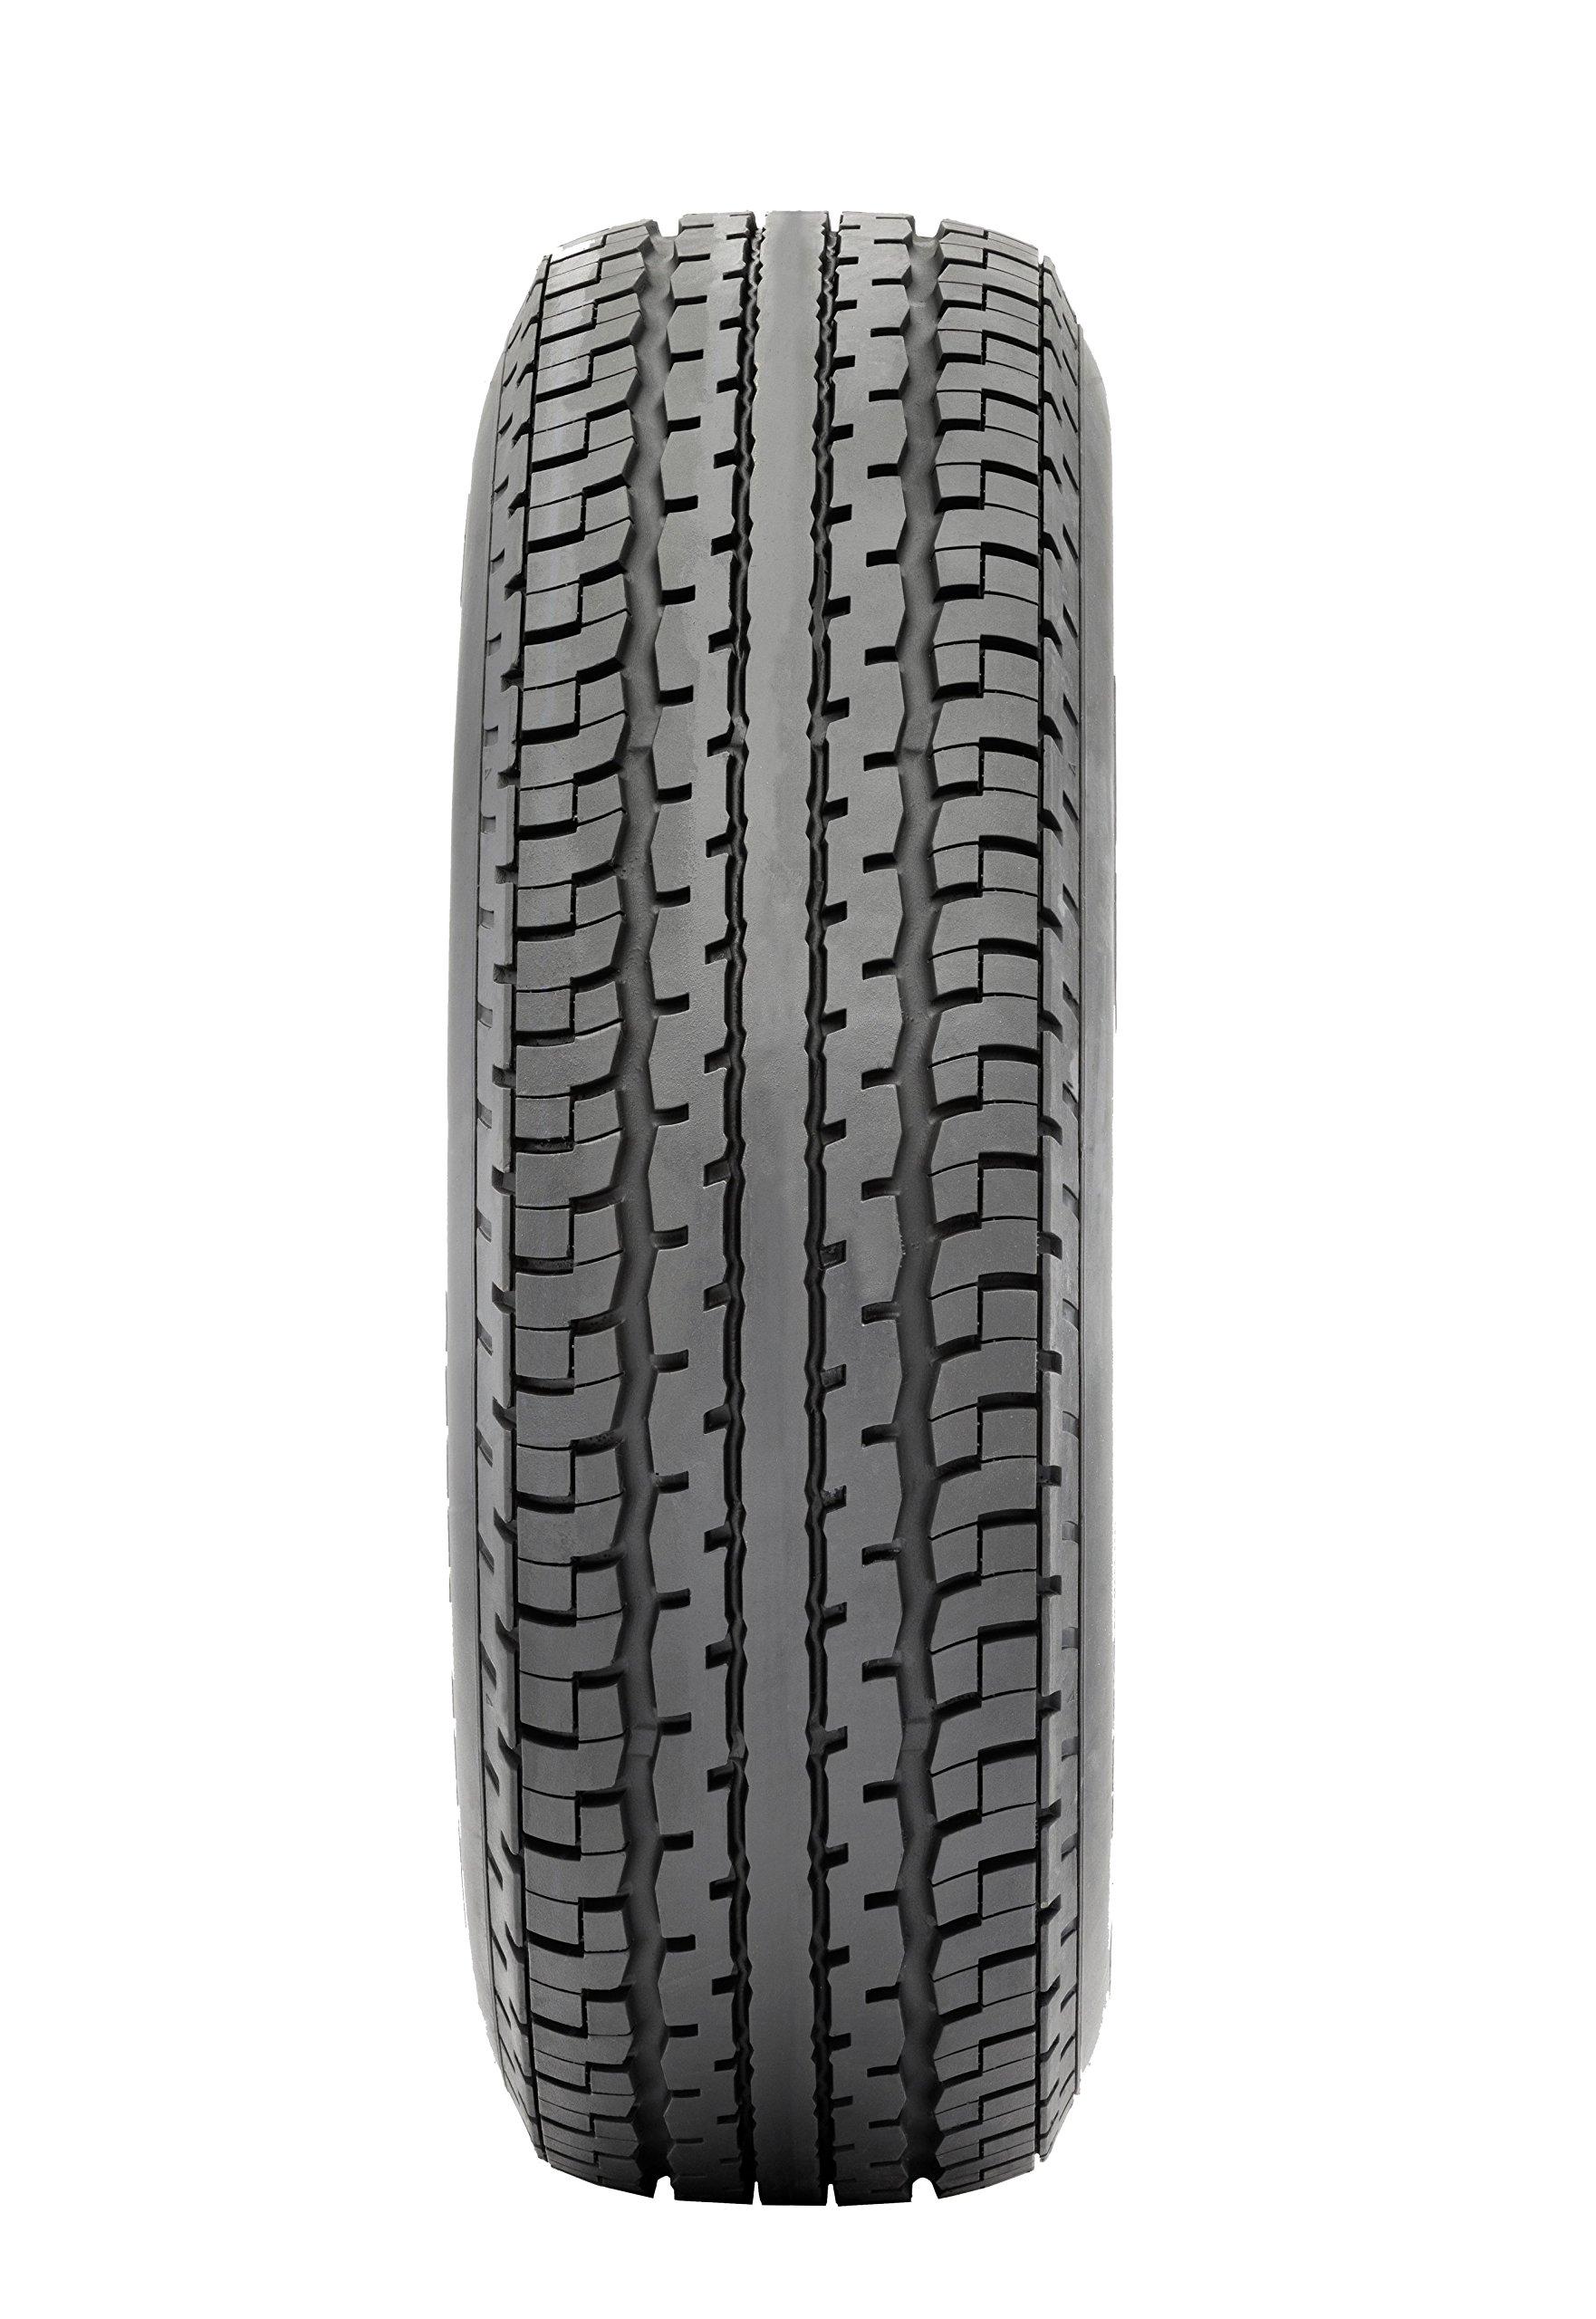 GT Radial MAXMILER ST Trailer Tire - ST175/80R13 9187M by GT Radial (Image #1)